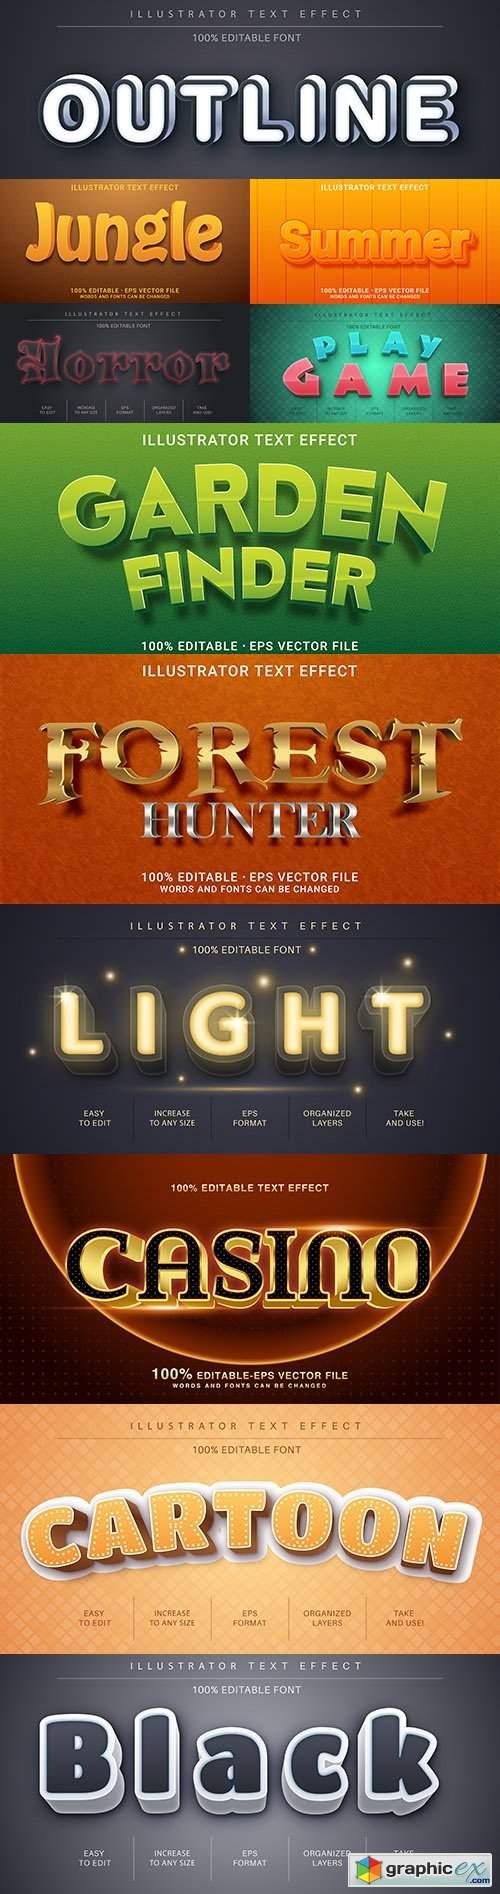 Editable font effect text collection illustration design 185